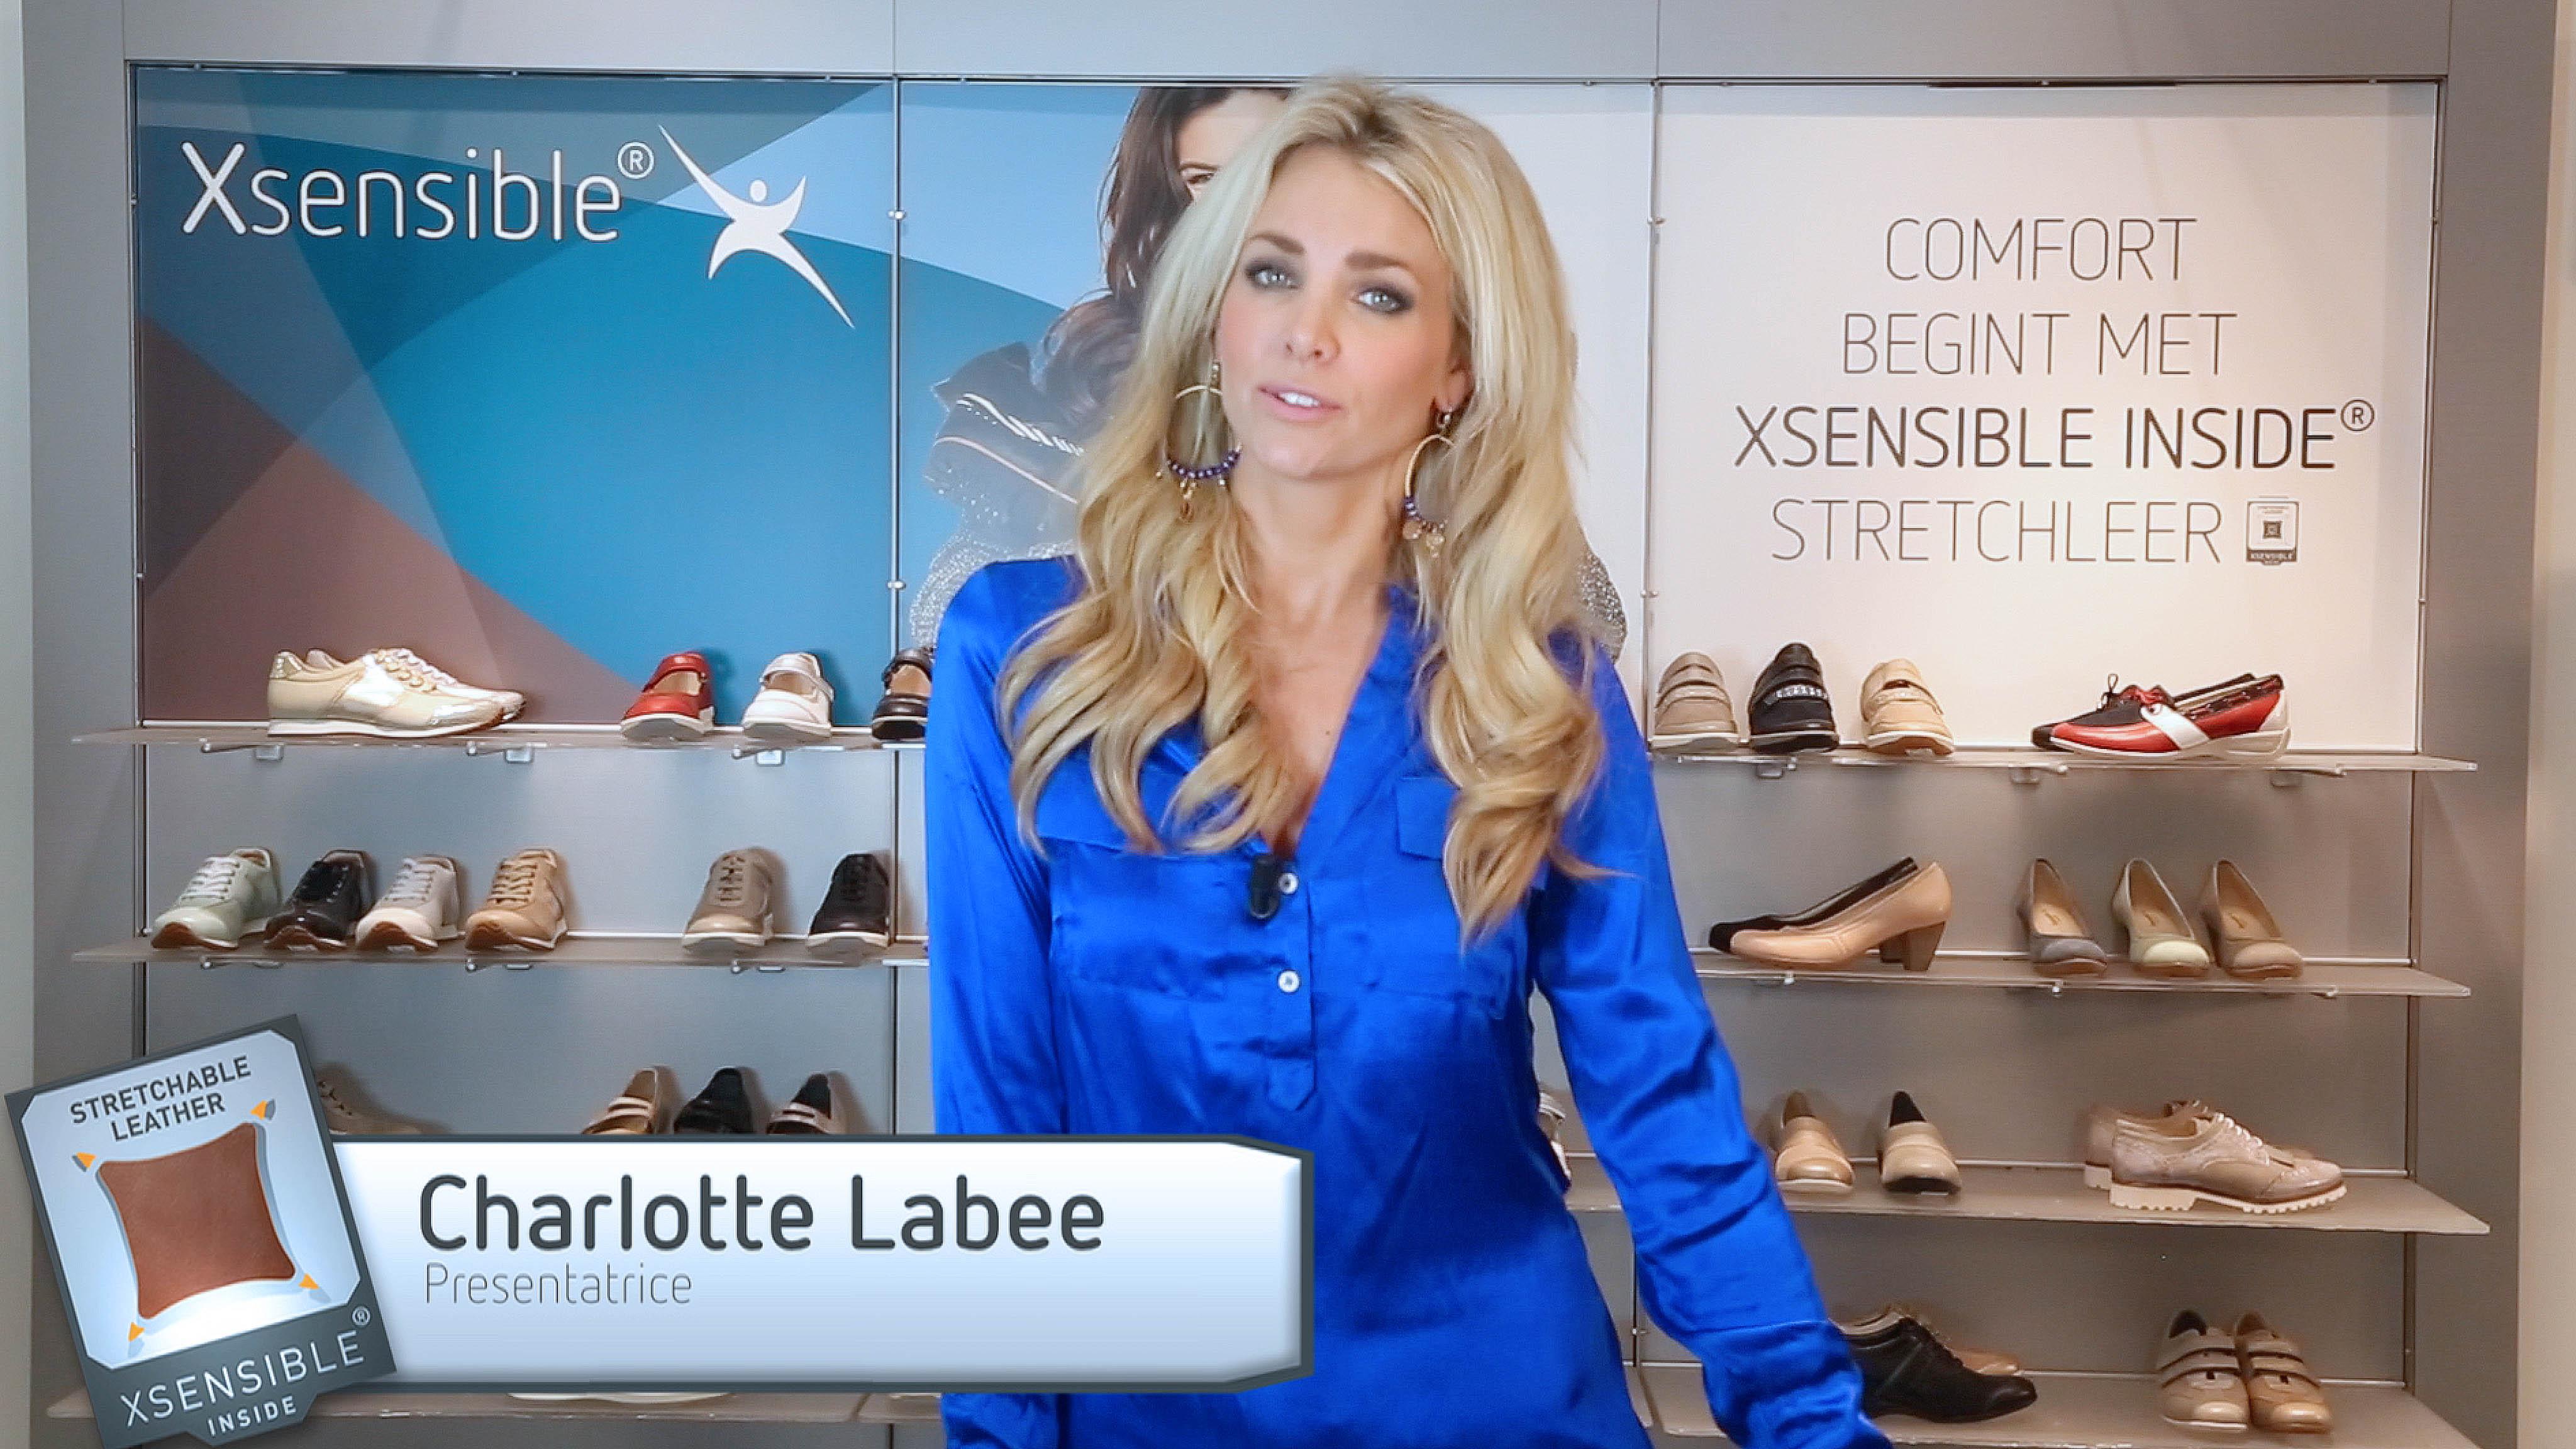 Charlotte Labee